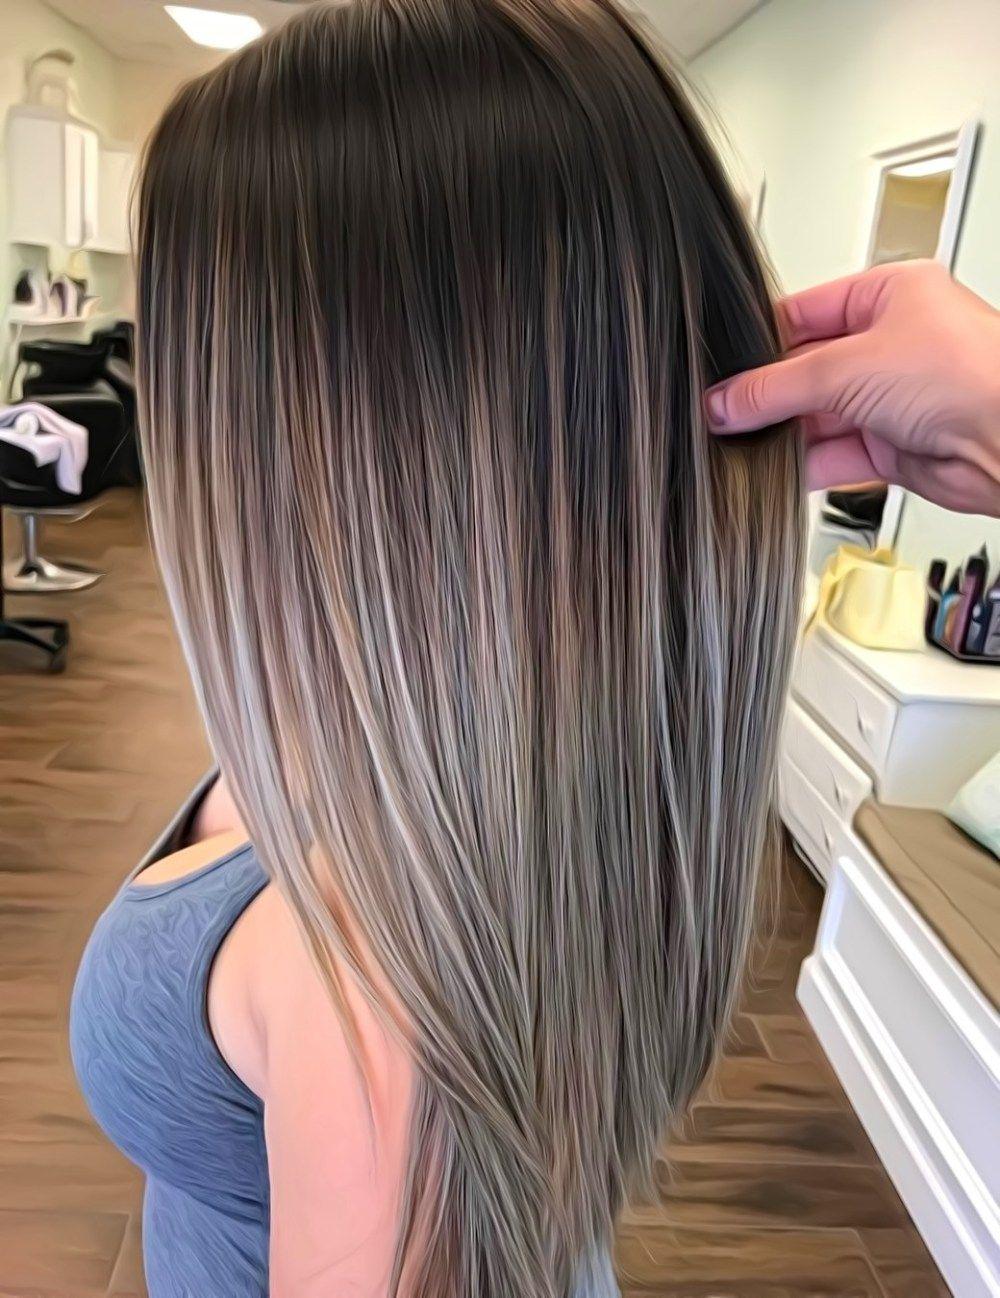 70 Flattering Balayage Hair Color Ideas For 2020 Balayage Straight Hair Gray Balayage Brown Ombre Hair